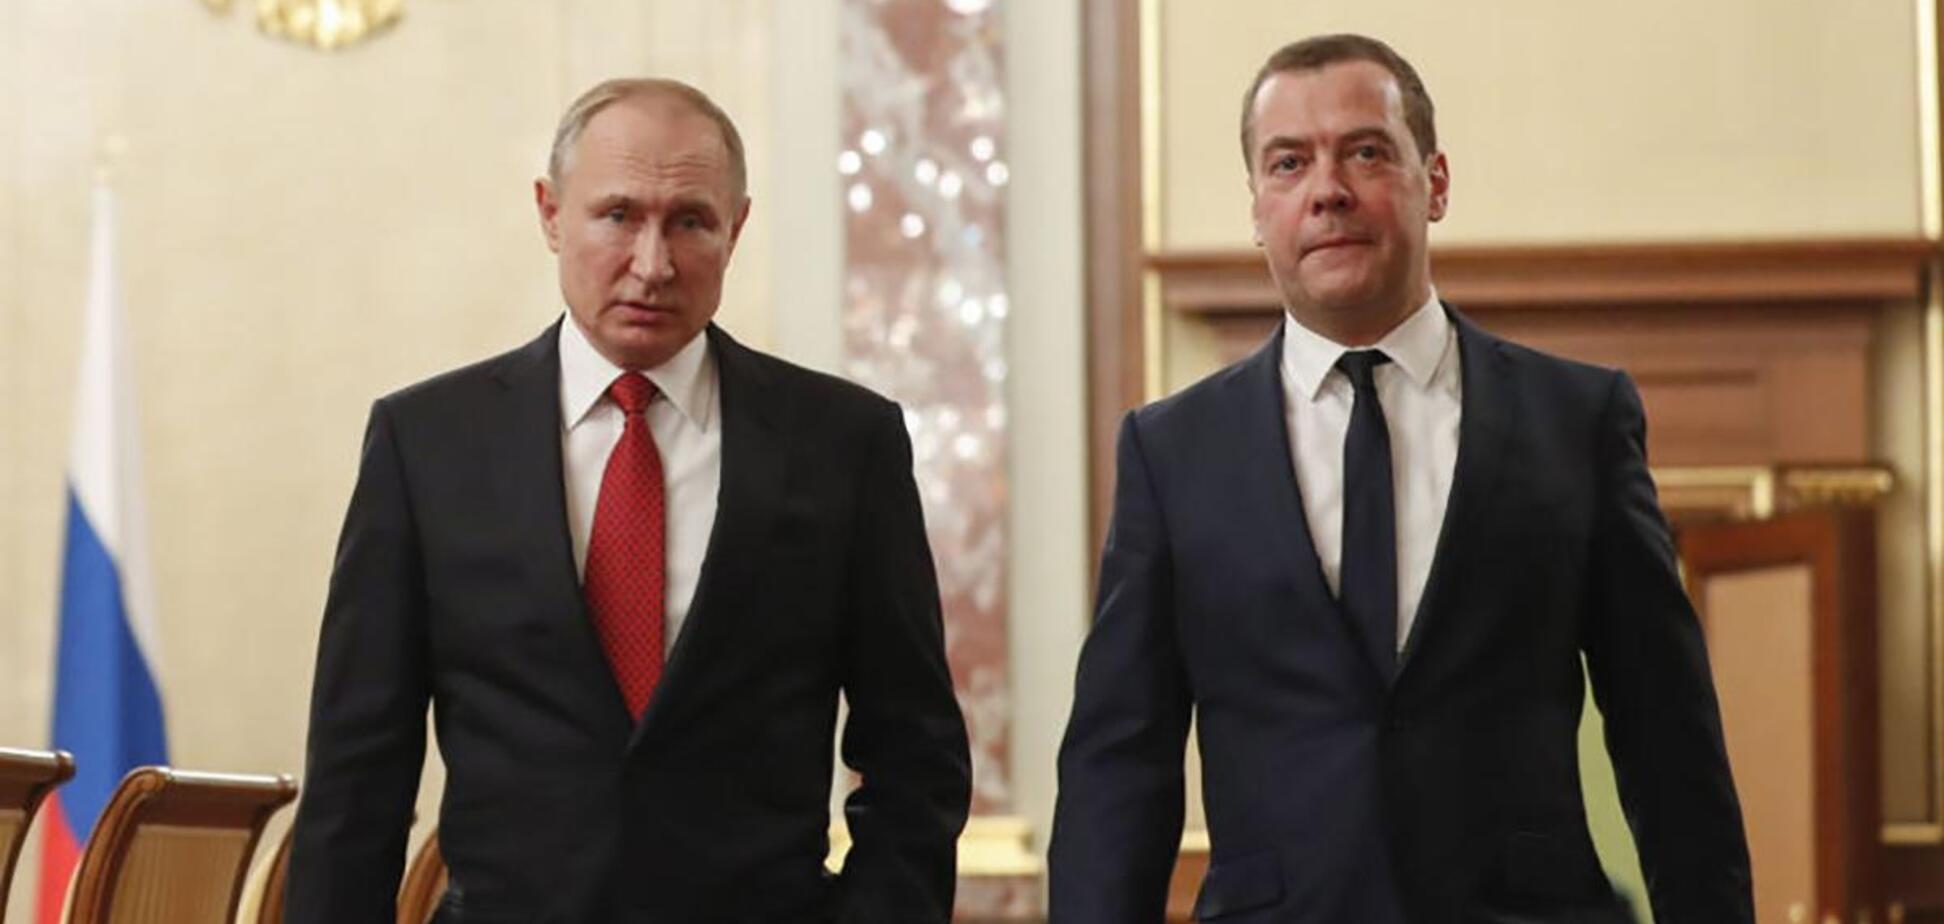 Как Путин хоронит Медведева